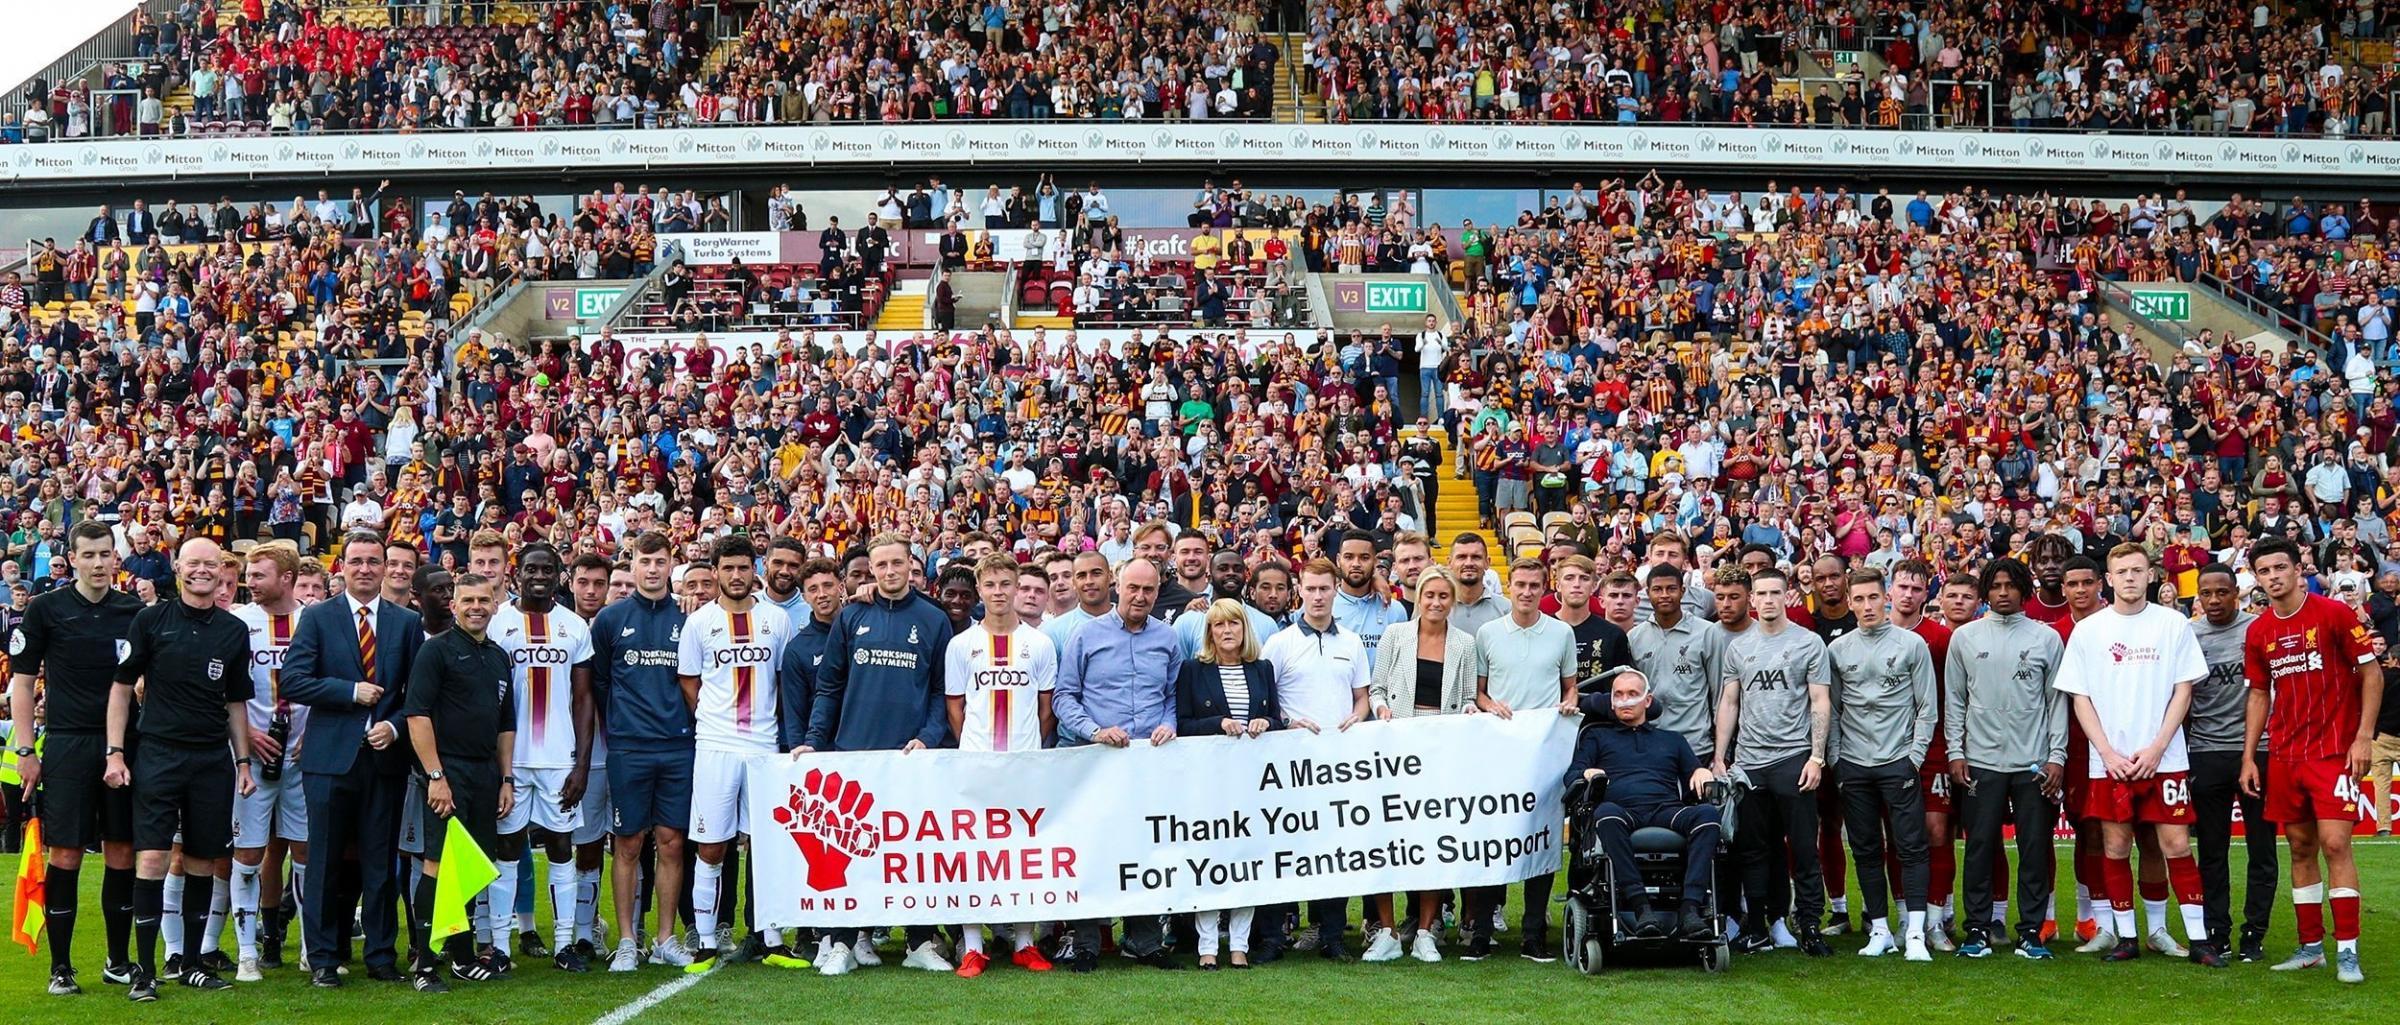 Bantams v Liverpool game raises over £275k for Stephen Darby fund